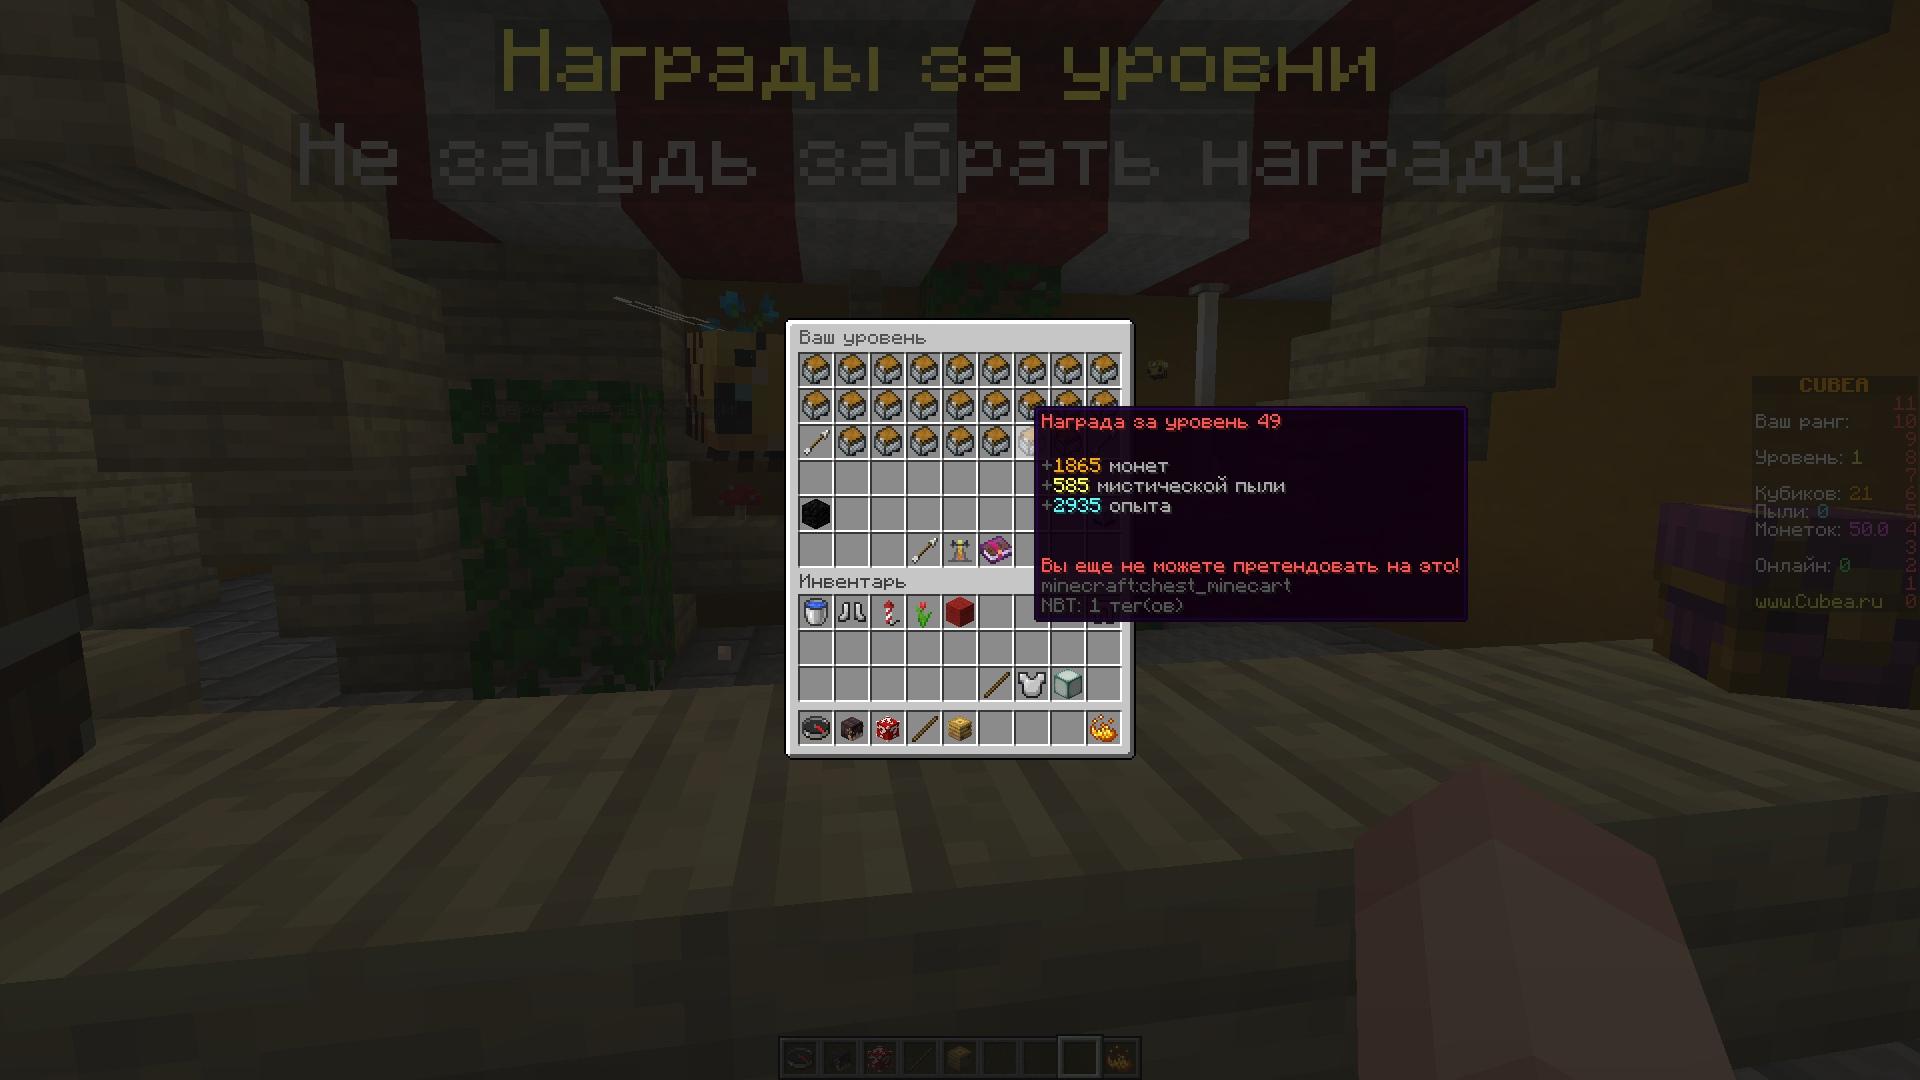 EzYLS8SHFJc.jpg